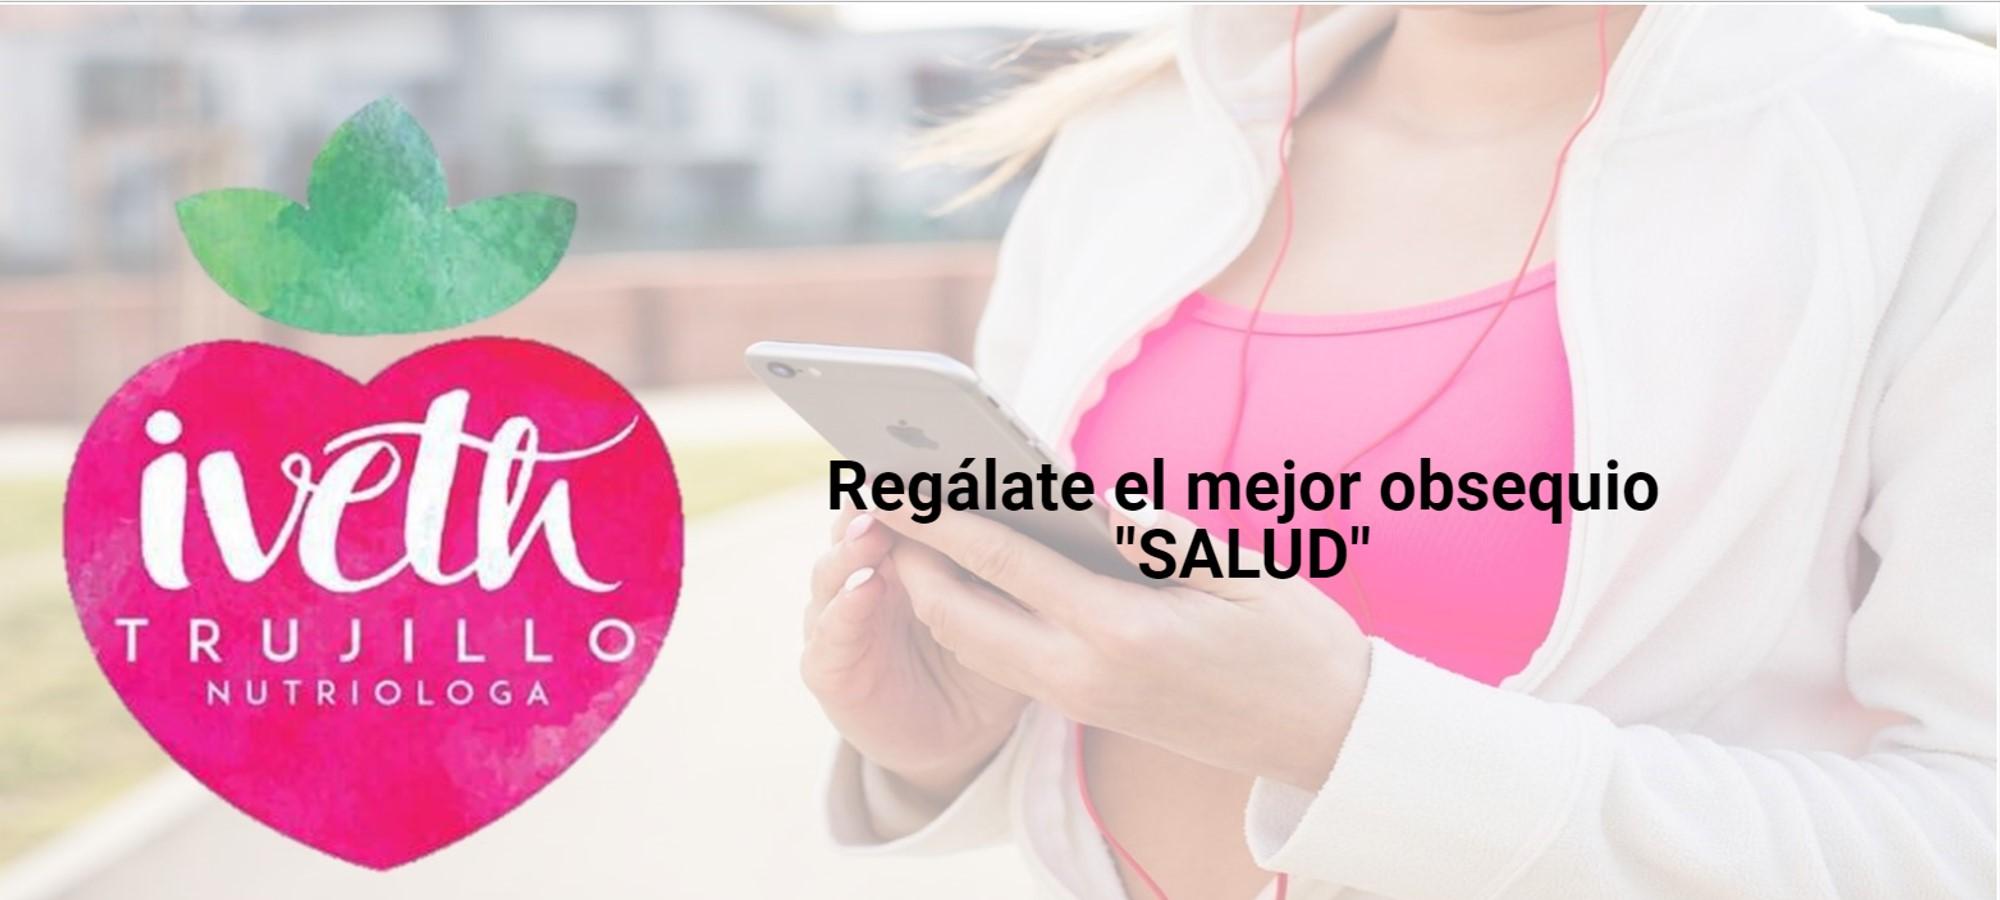 https://saludenlinea.com.mx/-iveth-trujillo-ochoa/